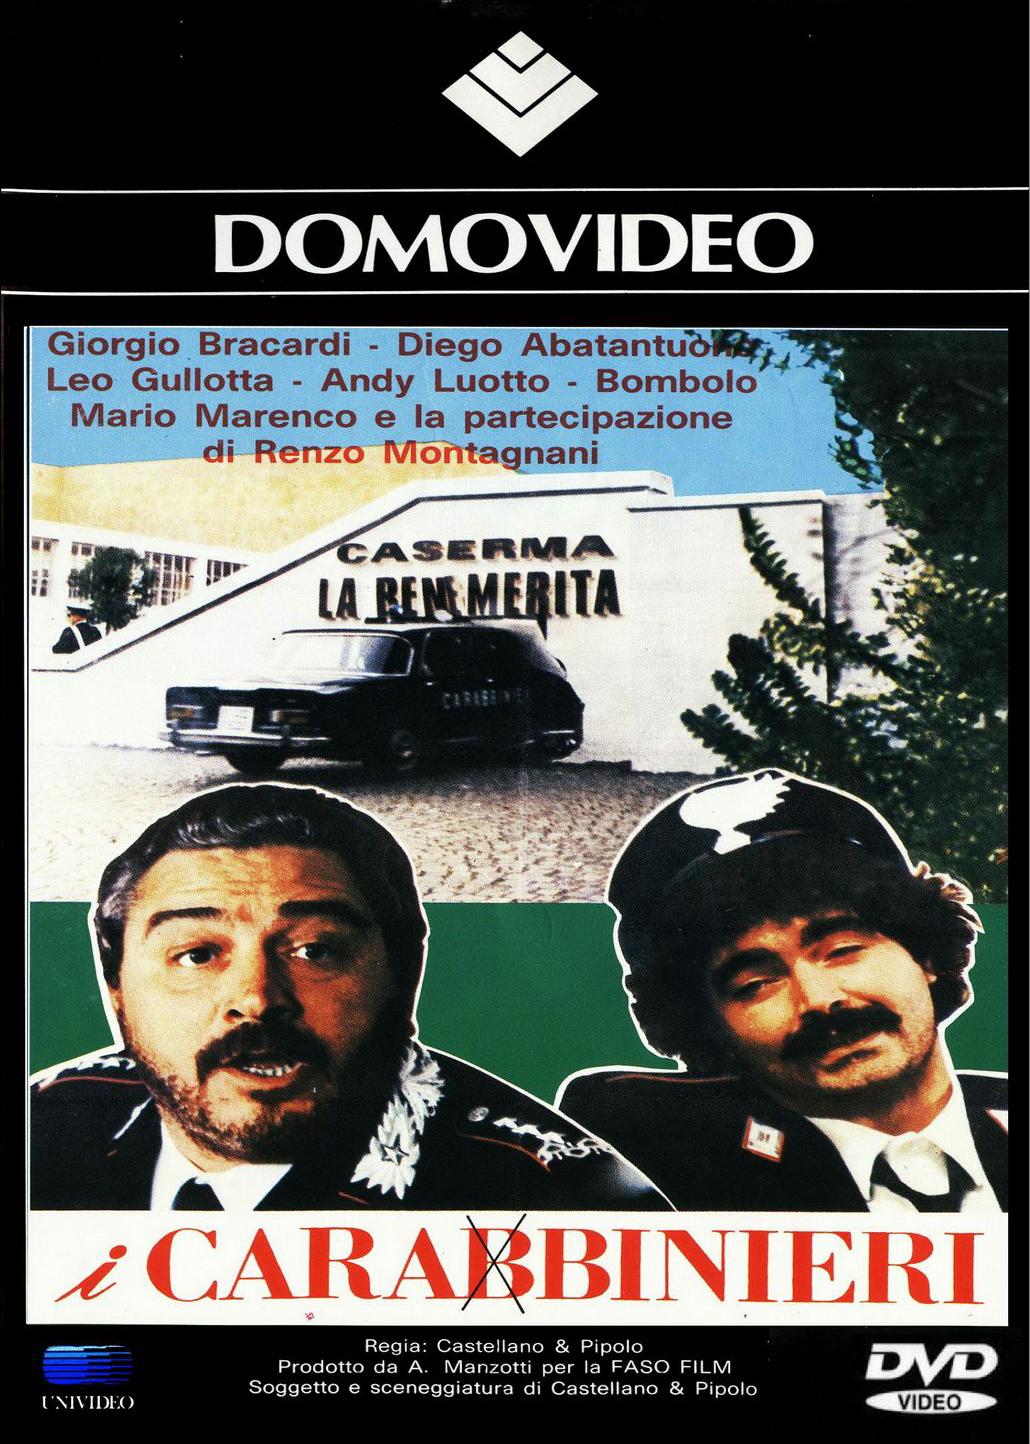 Donatella Damiani — The Movie Database (TMDb)